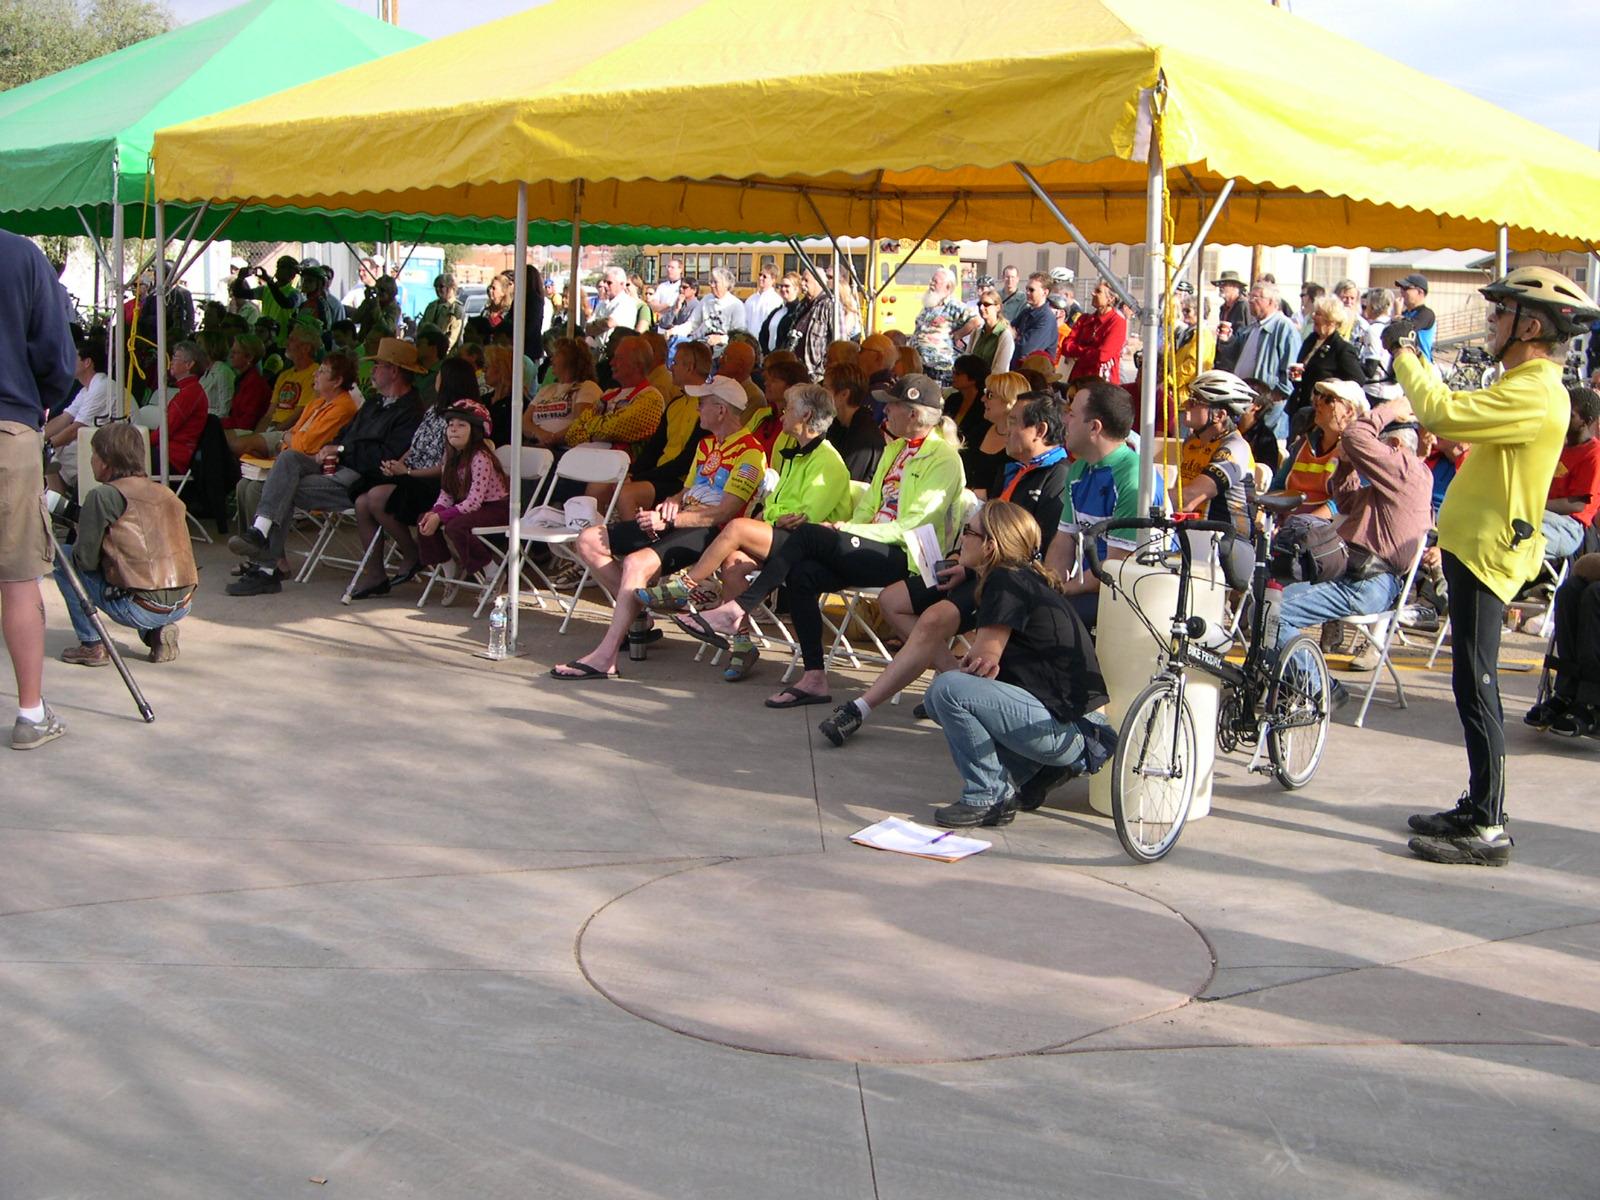 basket-bridge-tents-event.jpg